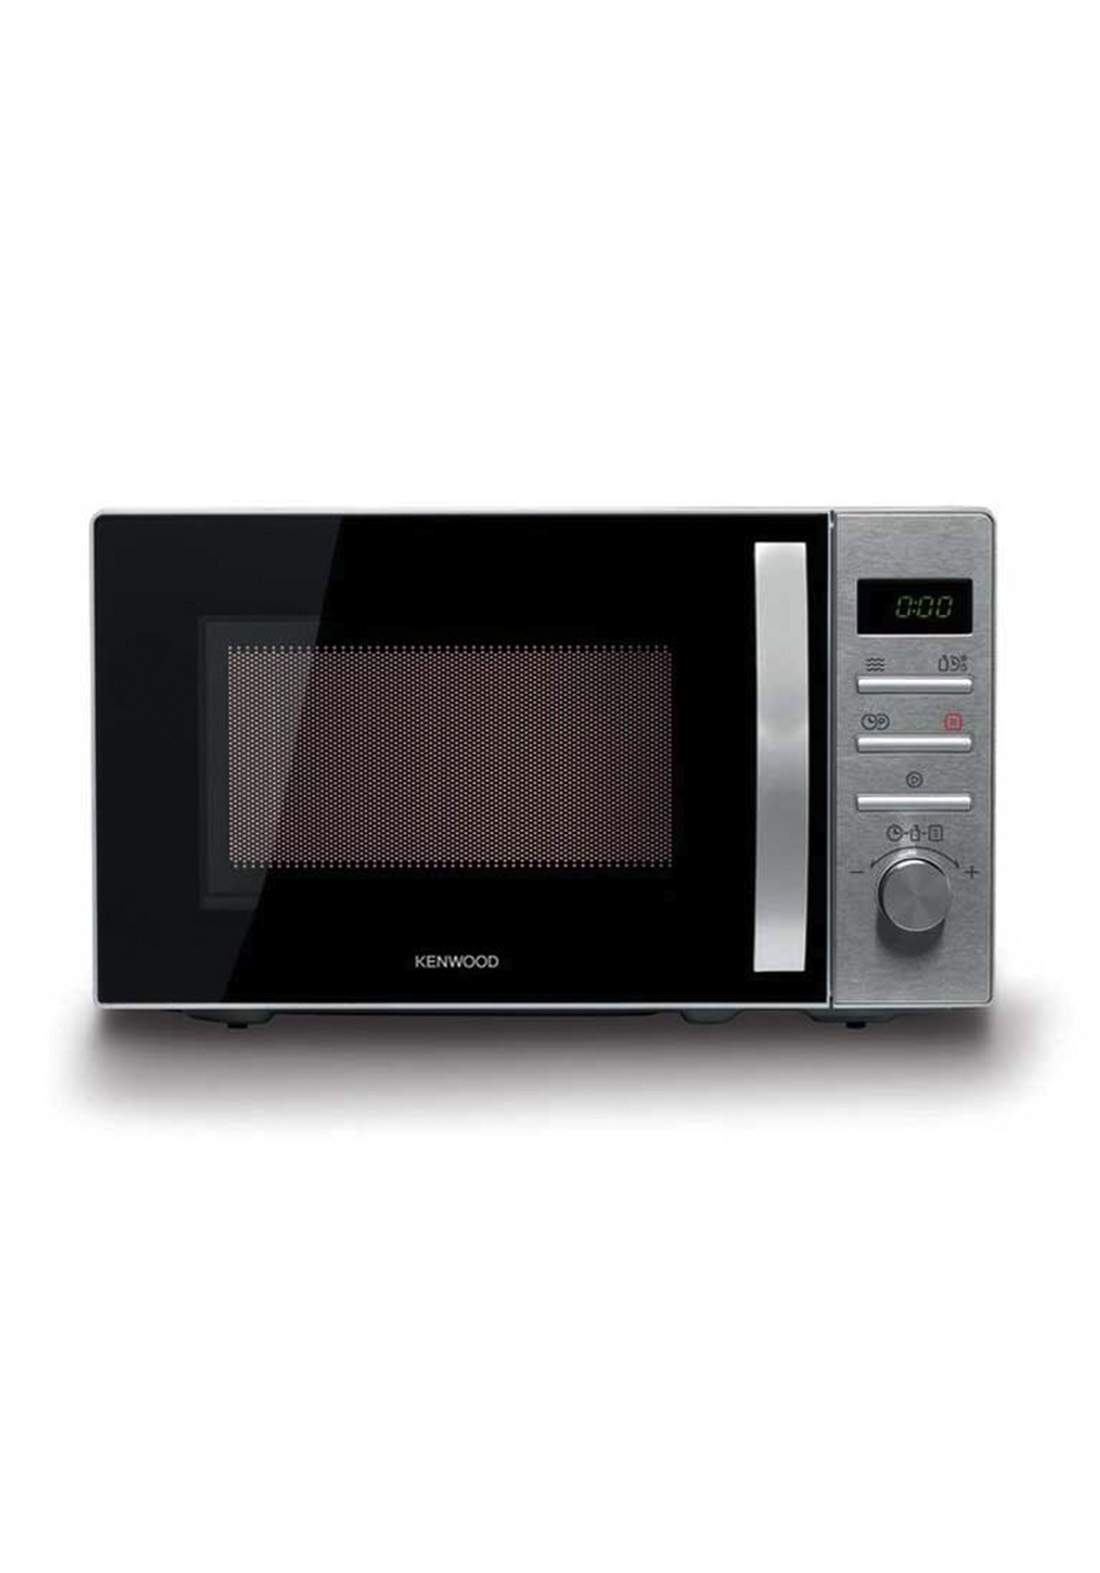 Kenwood  MWM22.000BK Microwave Oven  مايكروويف طعام